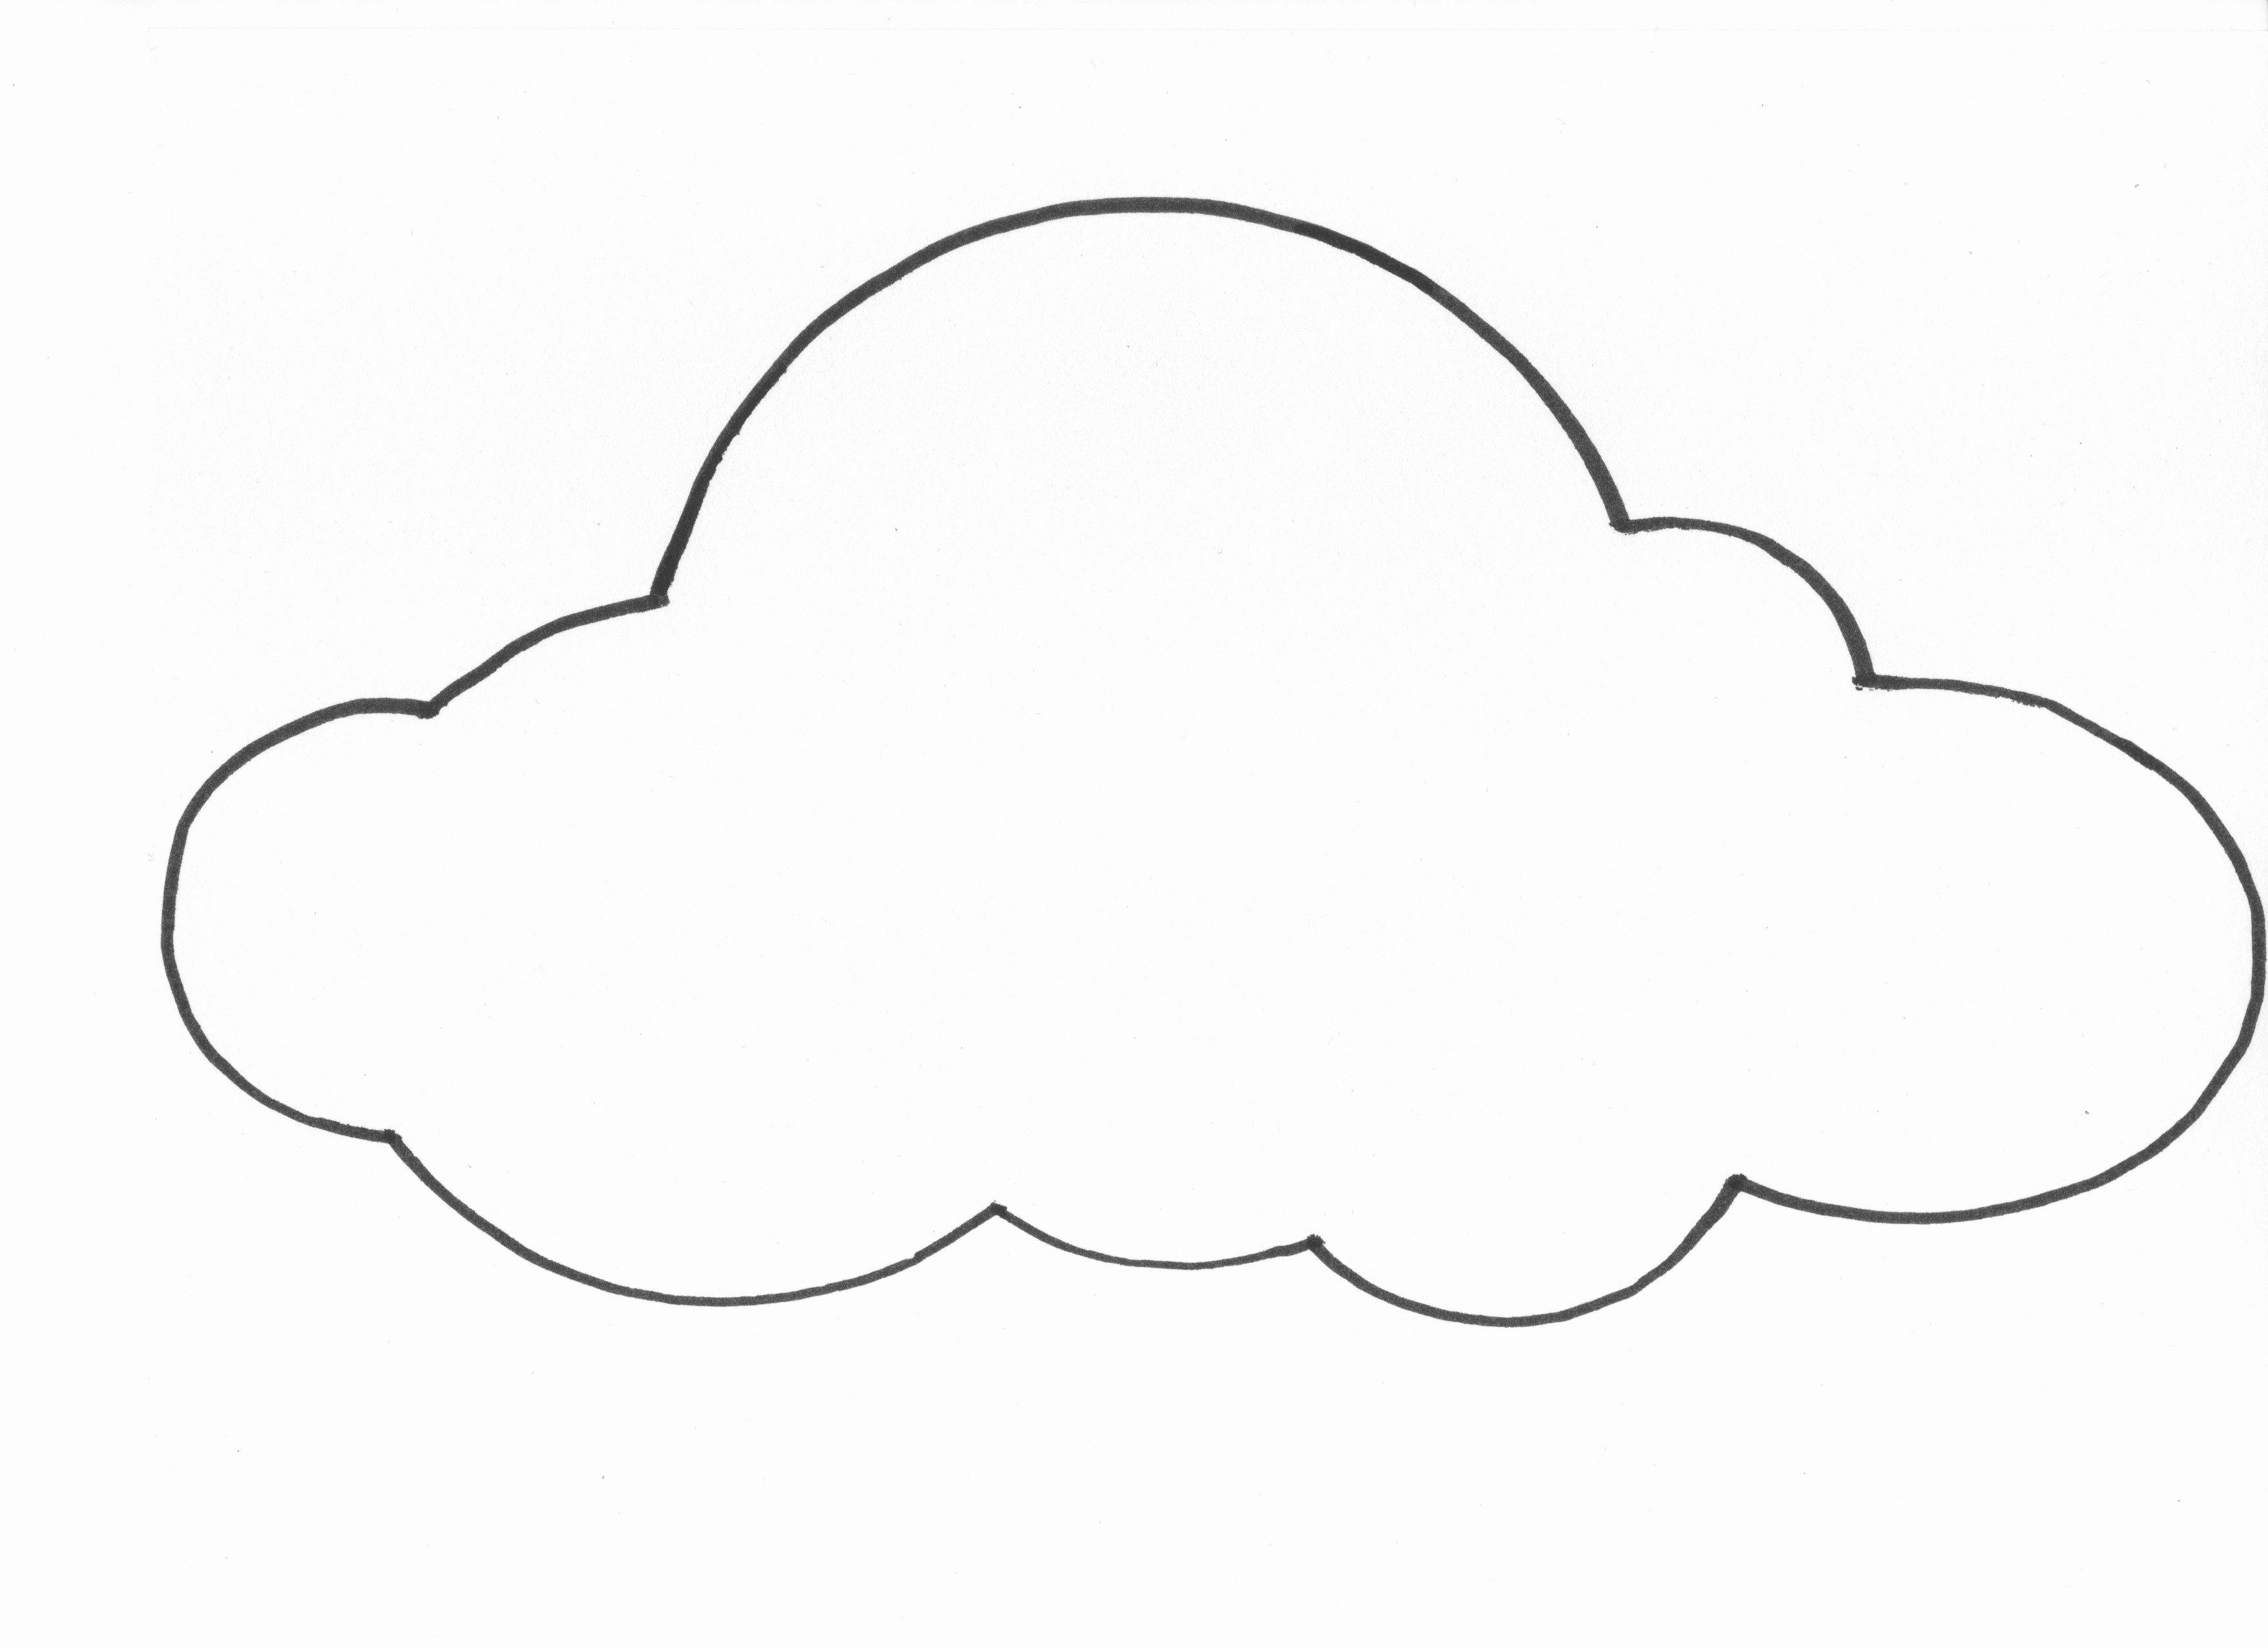 Cloud Template Printable Unique Free Printable Cloud Template Download Free Clip Art